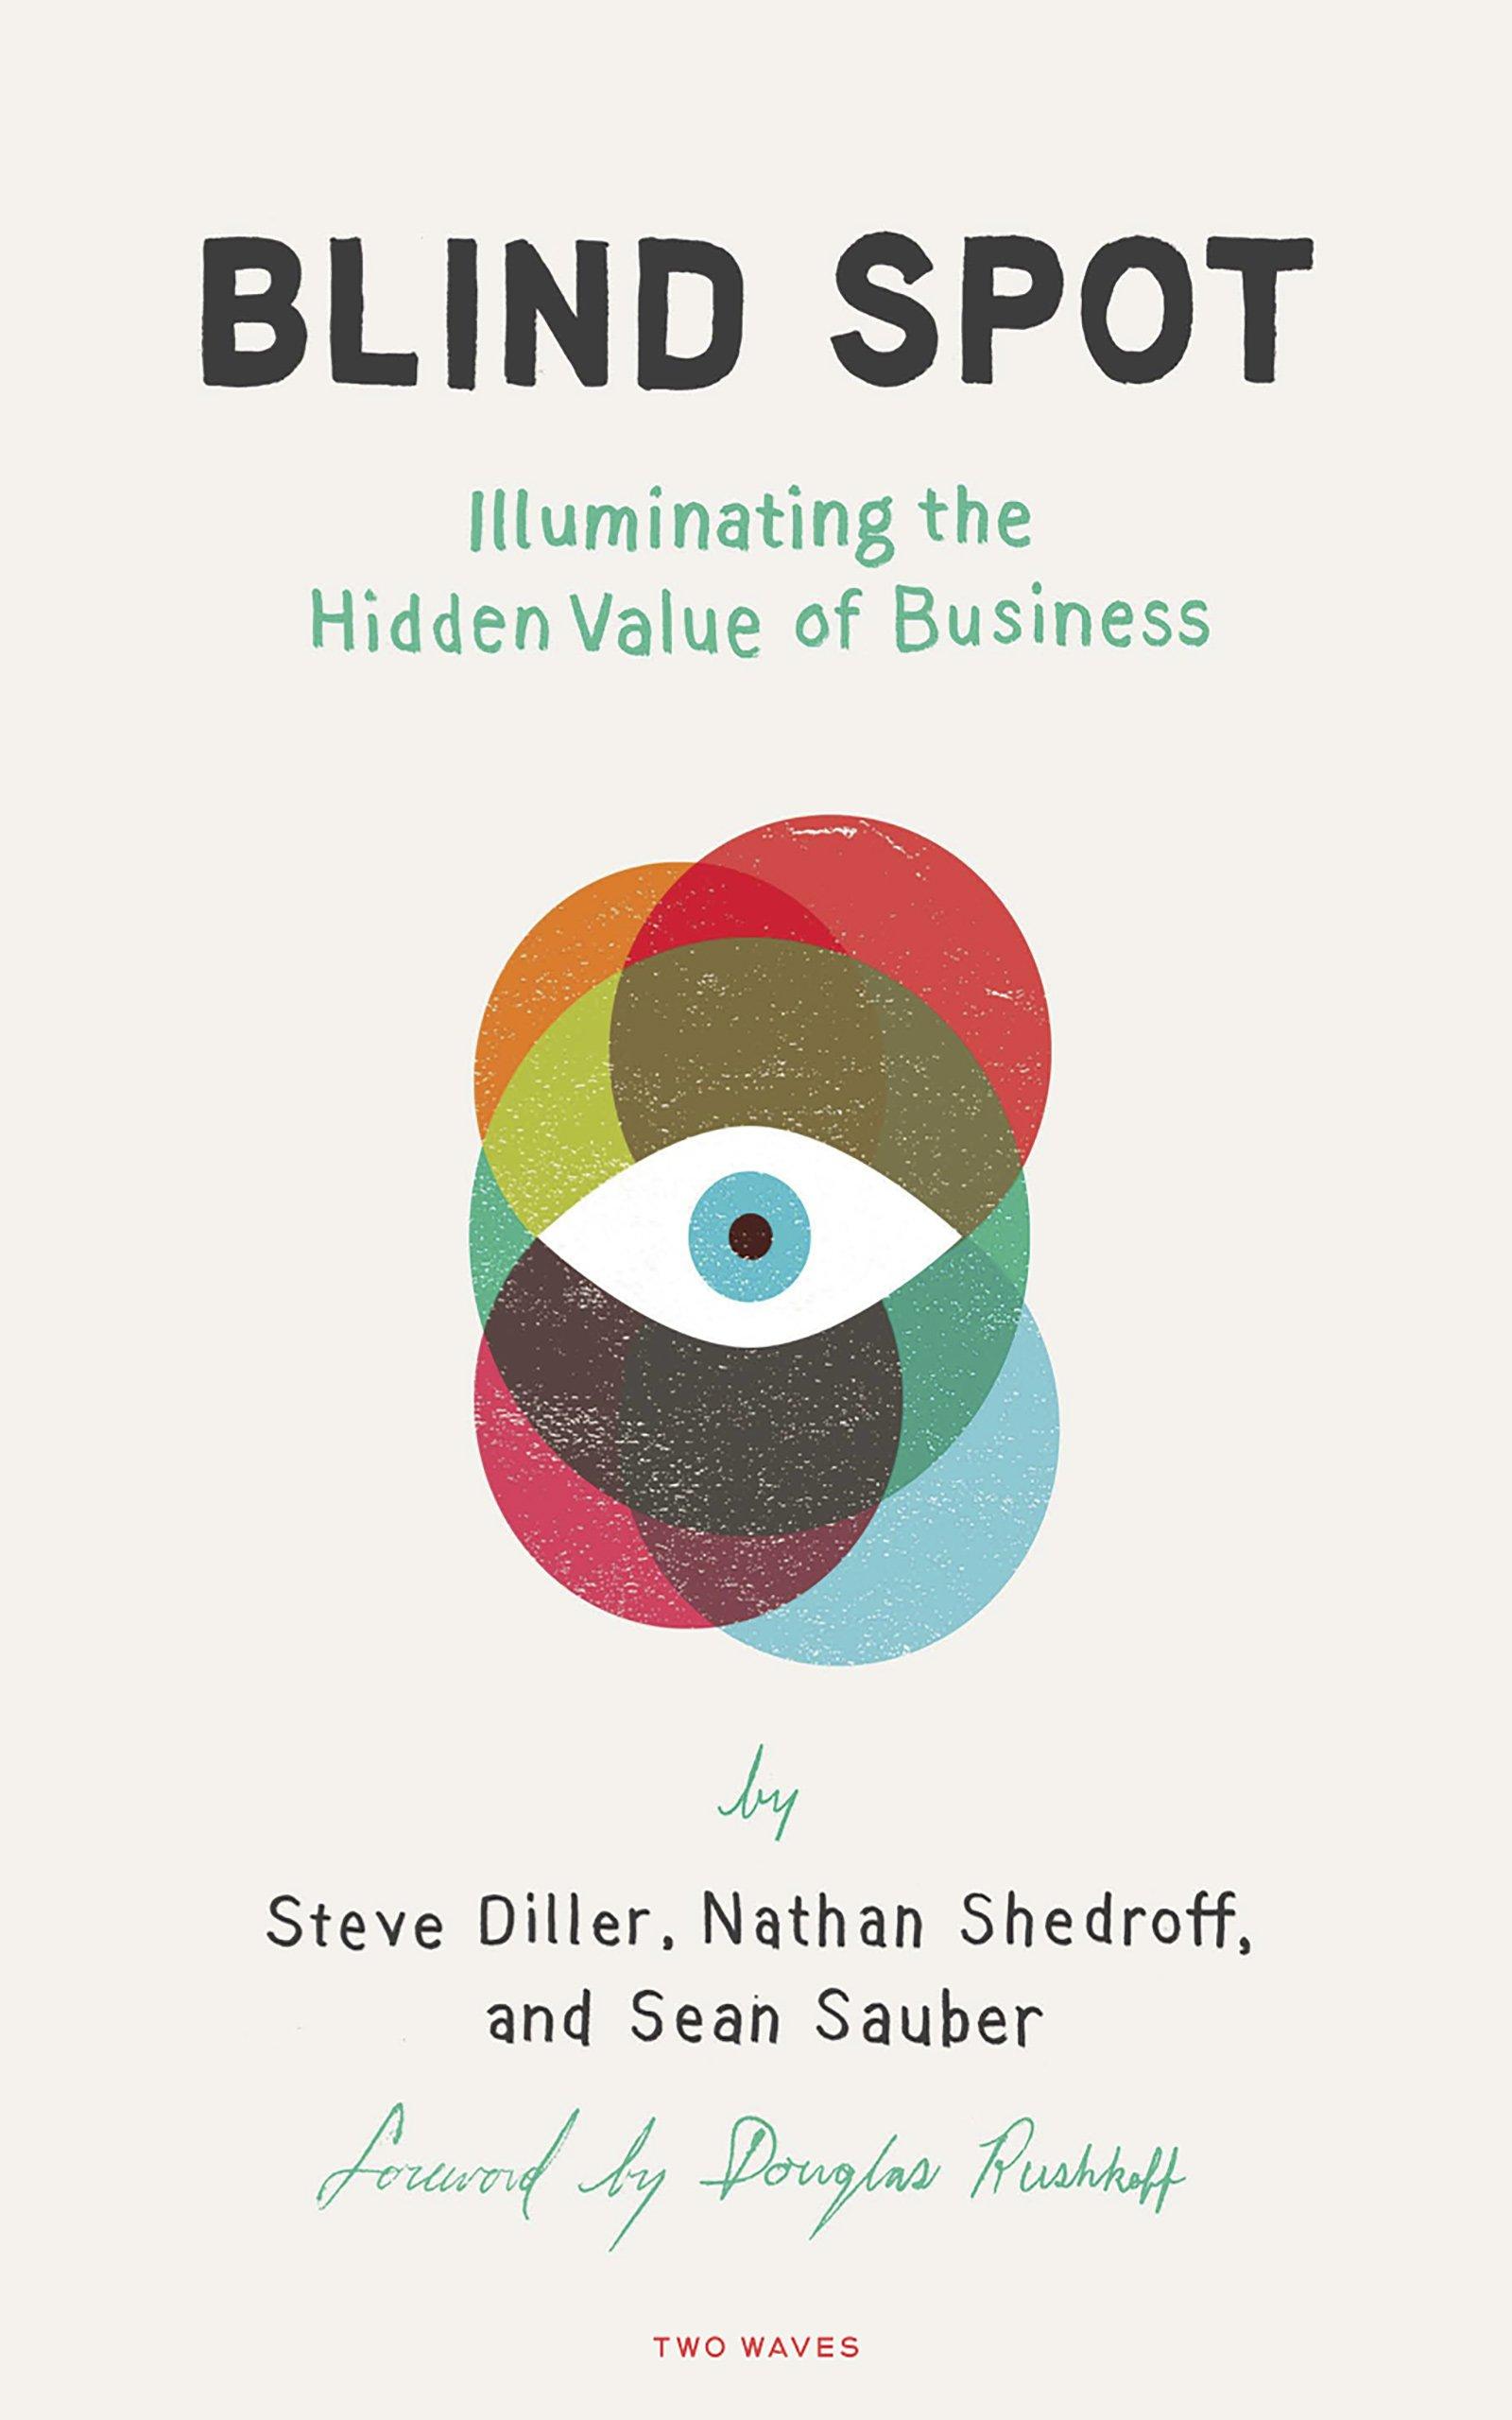 Blind Spot: Illuminating the Hidden Value In Business